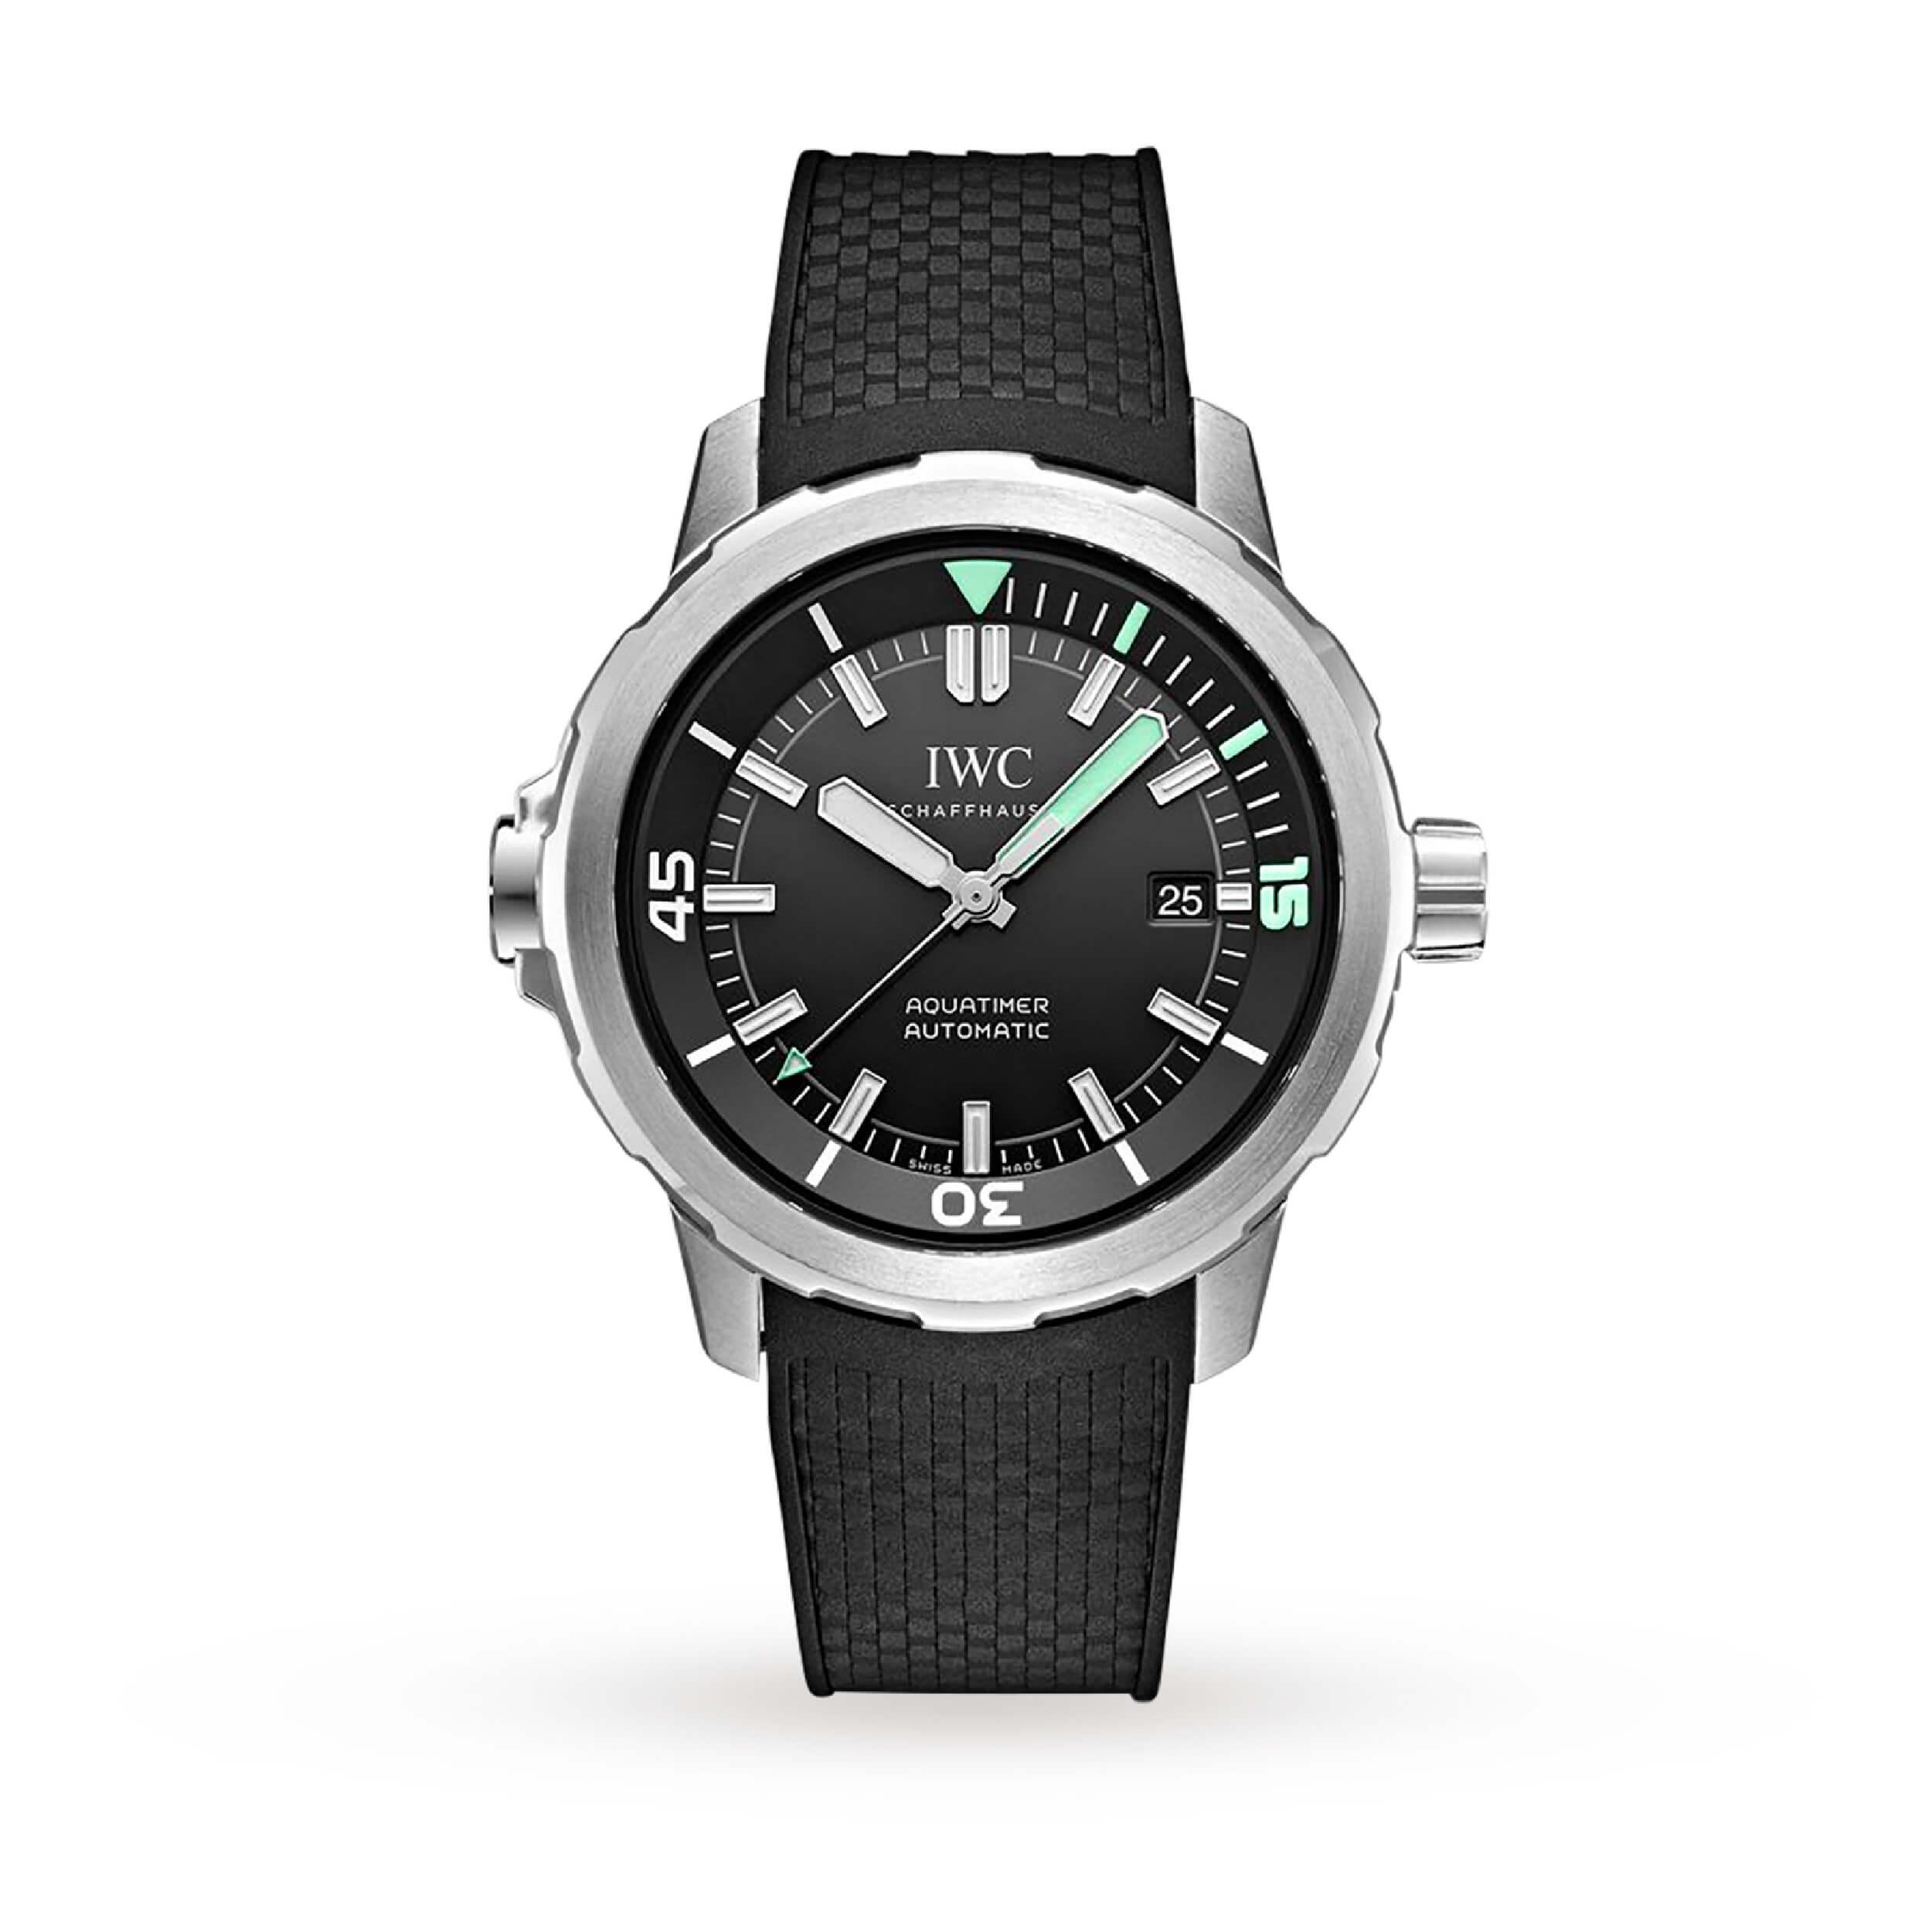 IWC Aquatimer Automatic | Wristwatches360